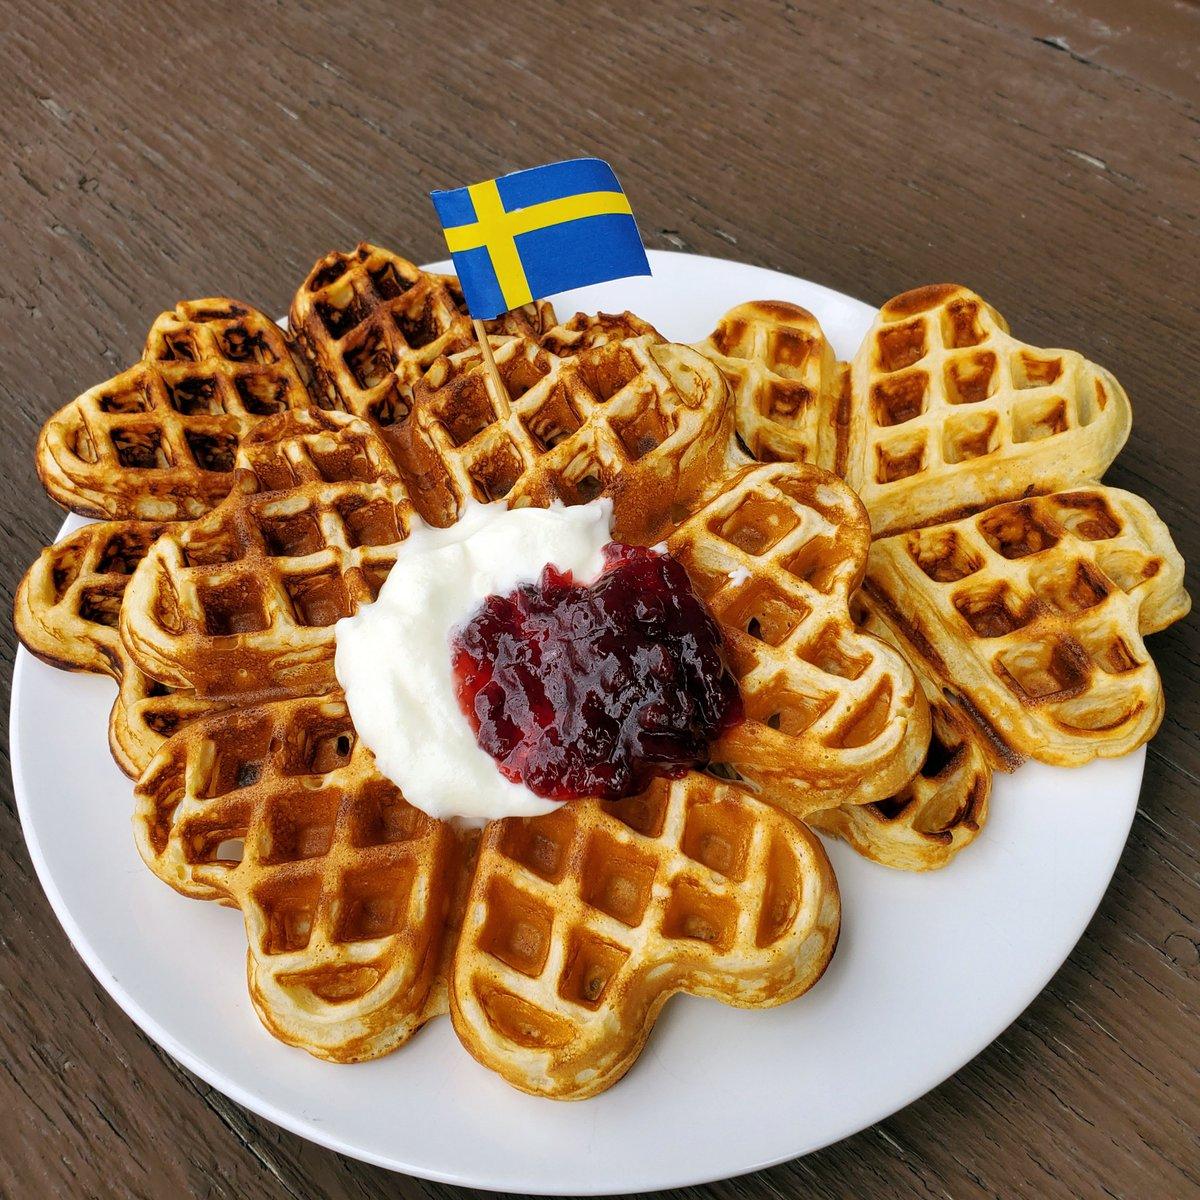 "FIKA on Twitter: ""It's #Våffeldagen (Swedish Waffle Day), so we're making lots of #waffles from home today!… """